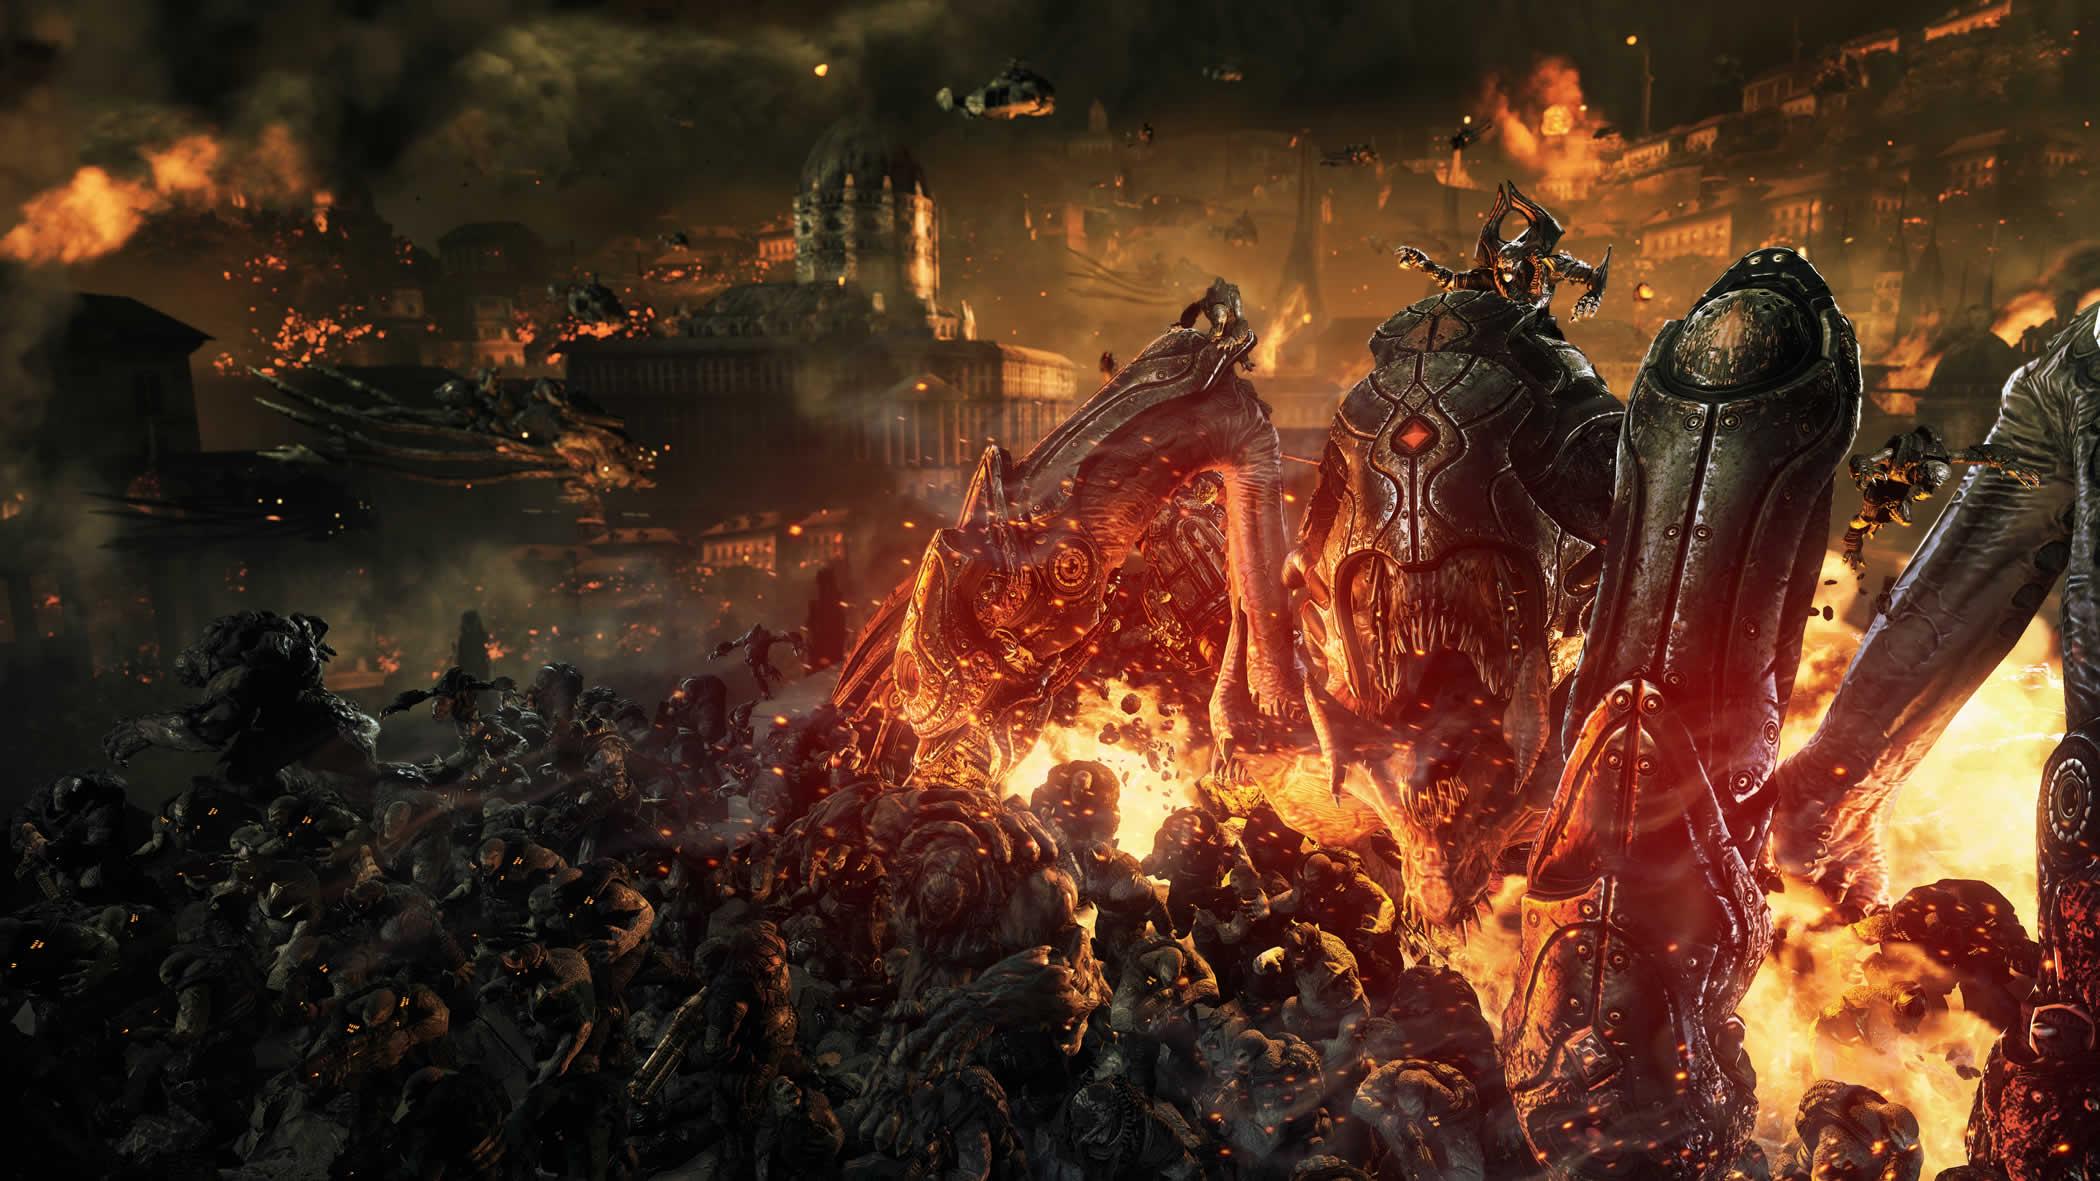 Locust (Gears of War)